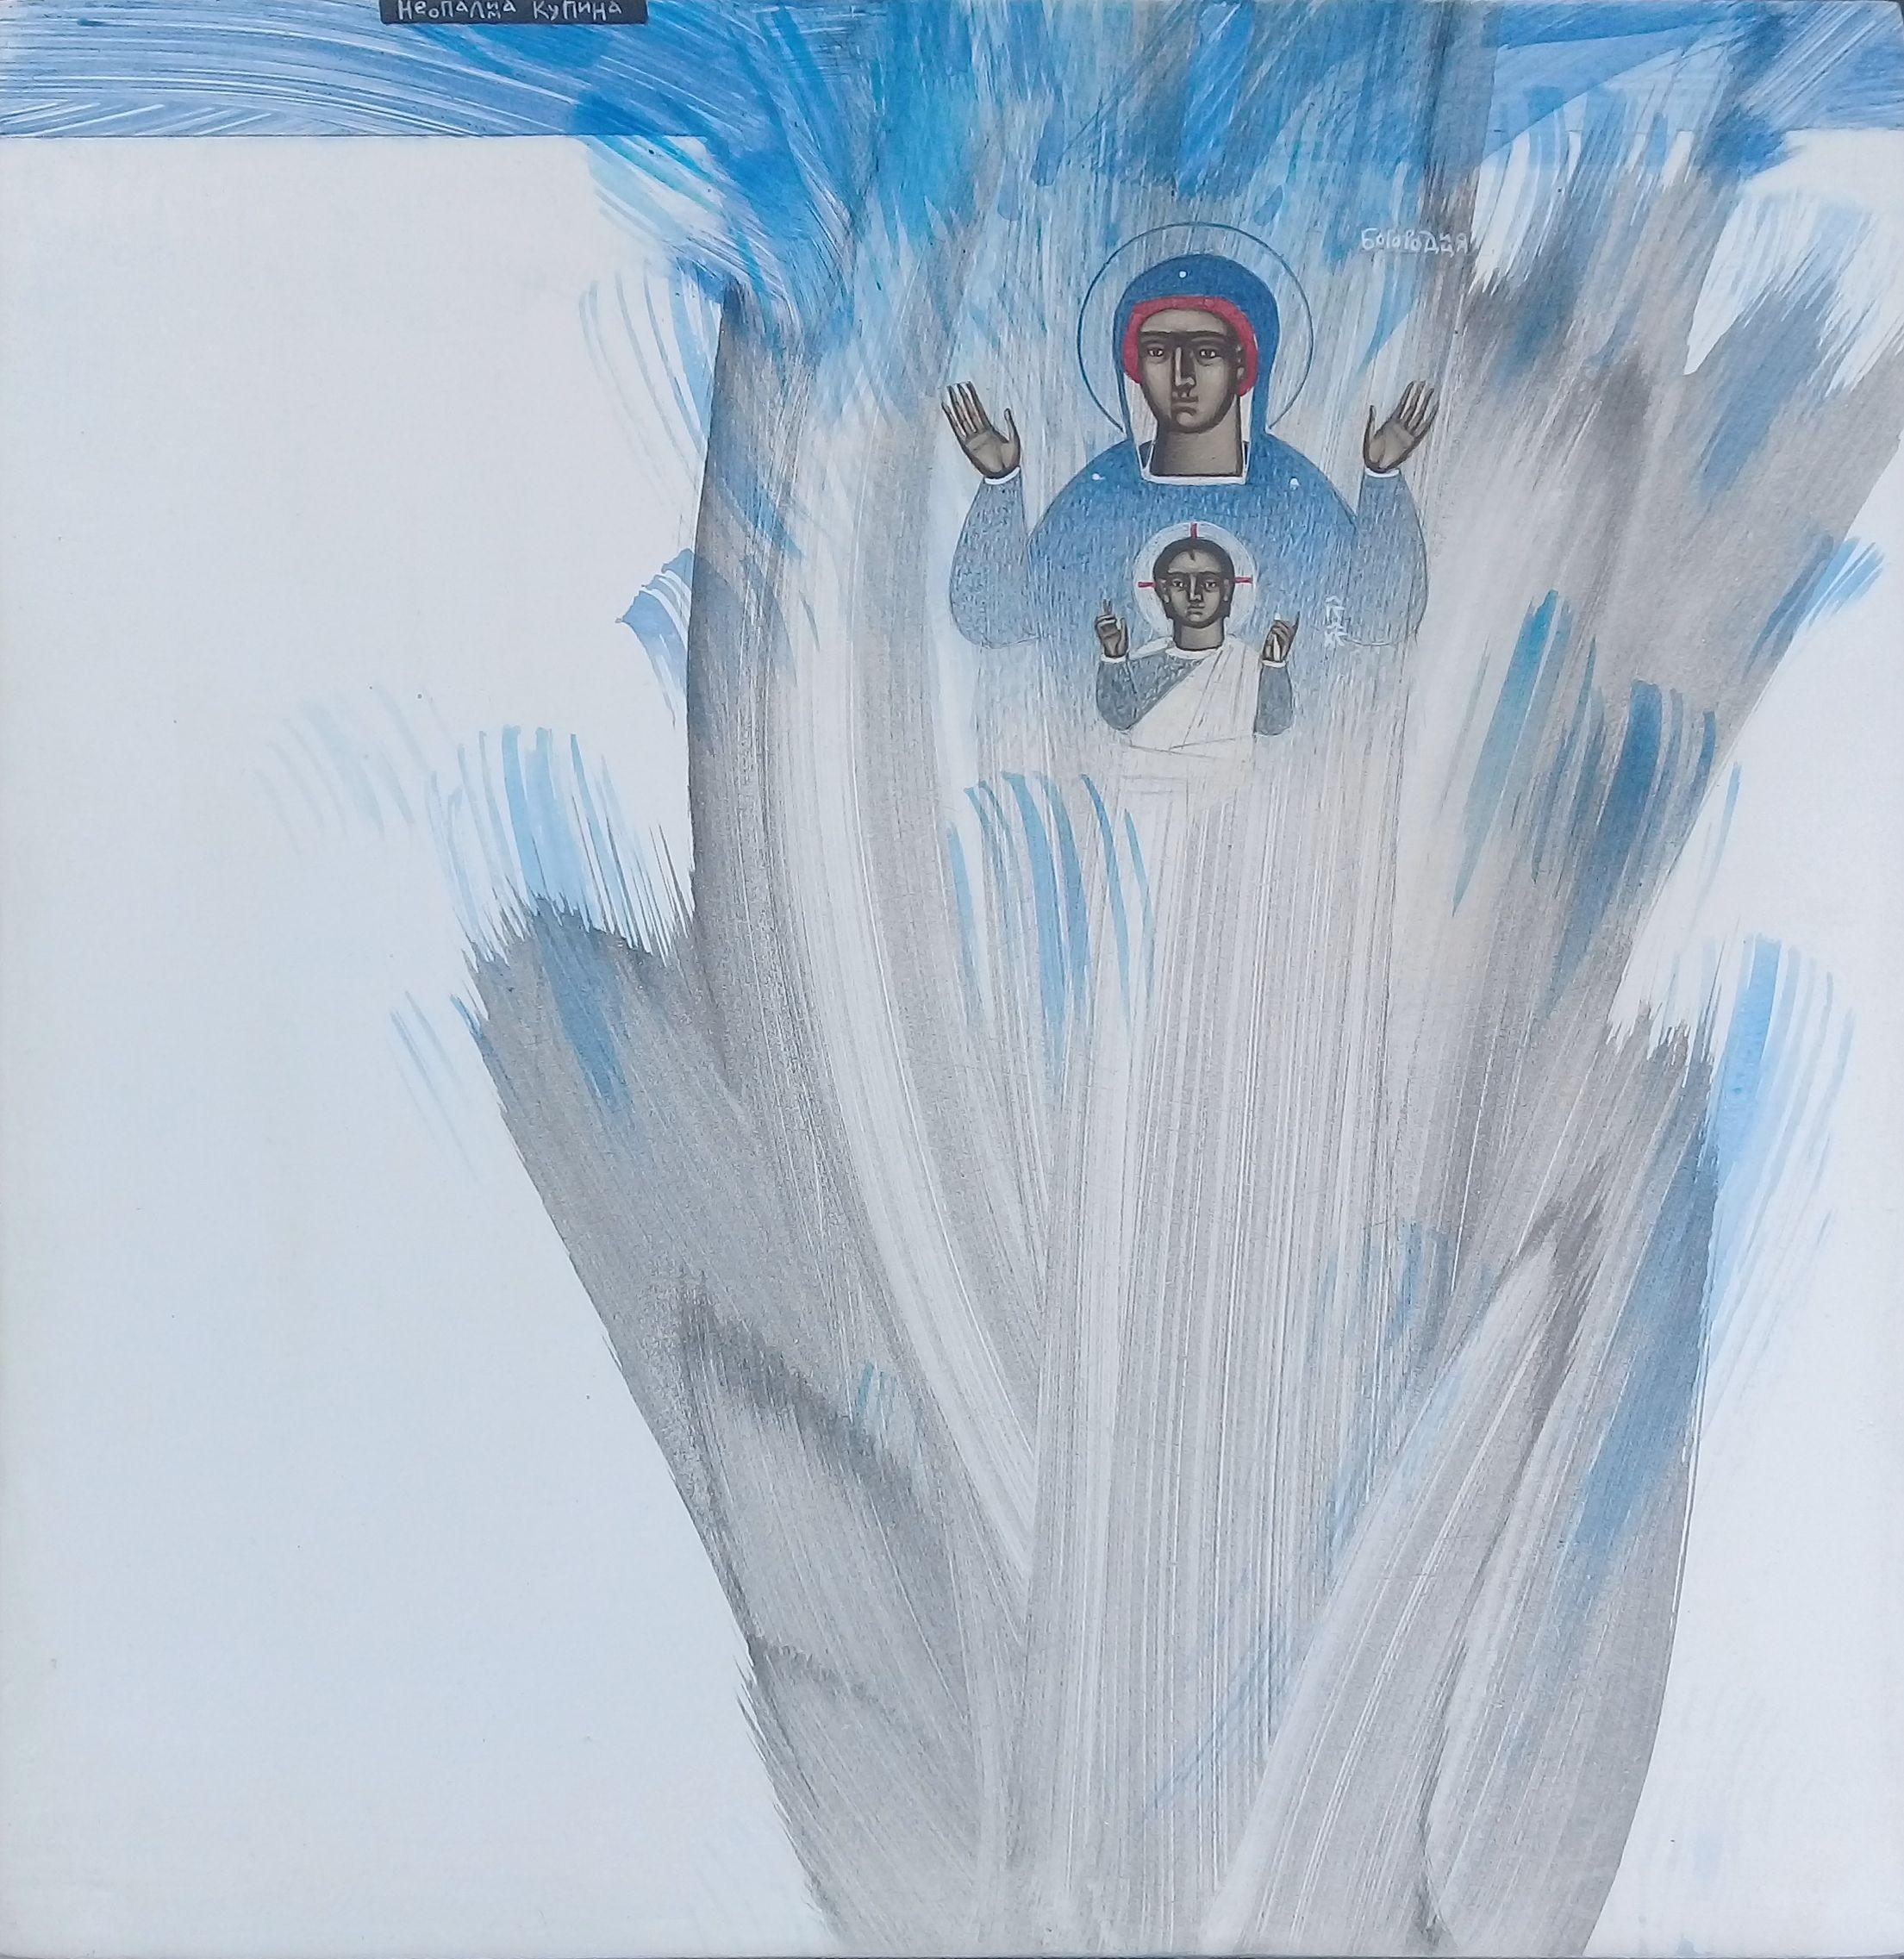 Катерина Кузів. Неопалима купина, 2020; Дошка, левкас, жовткова темпера, 30х30